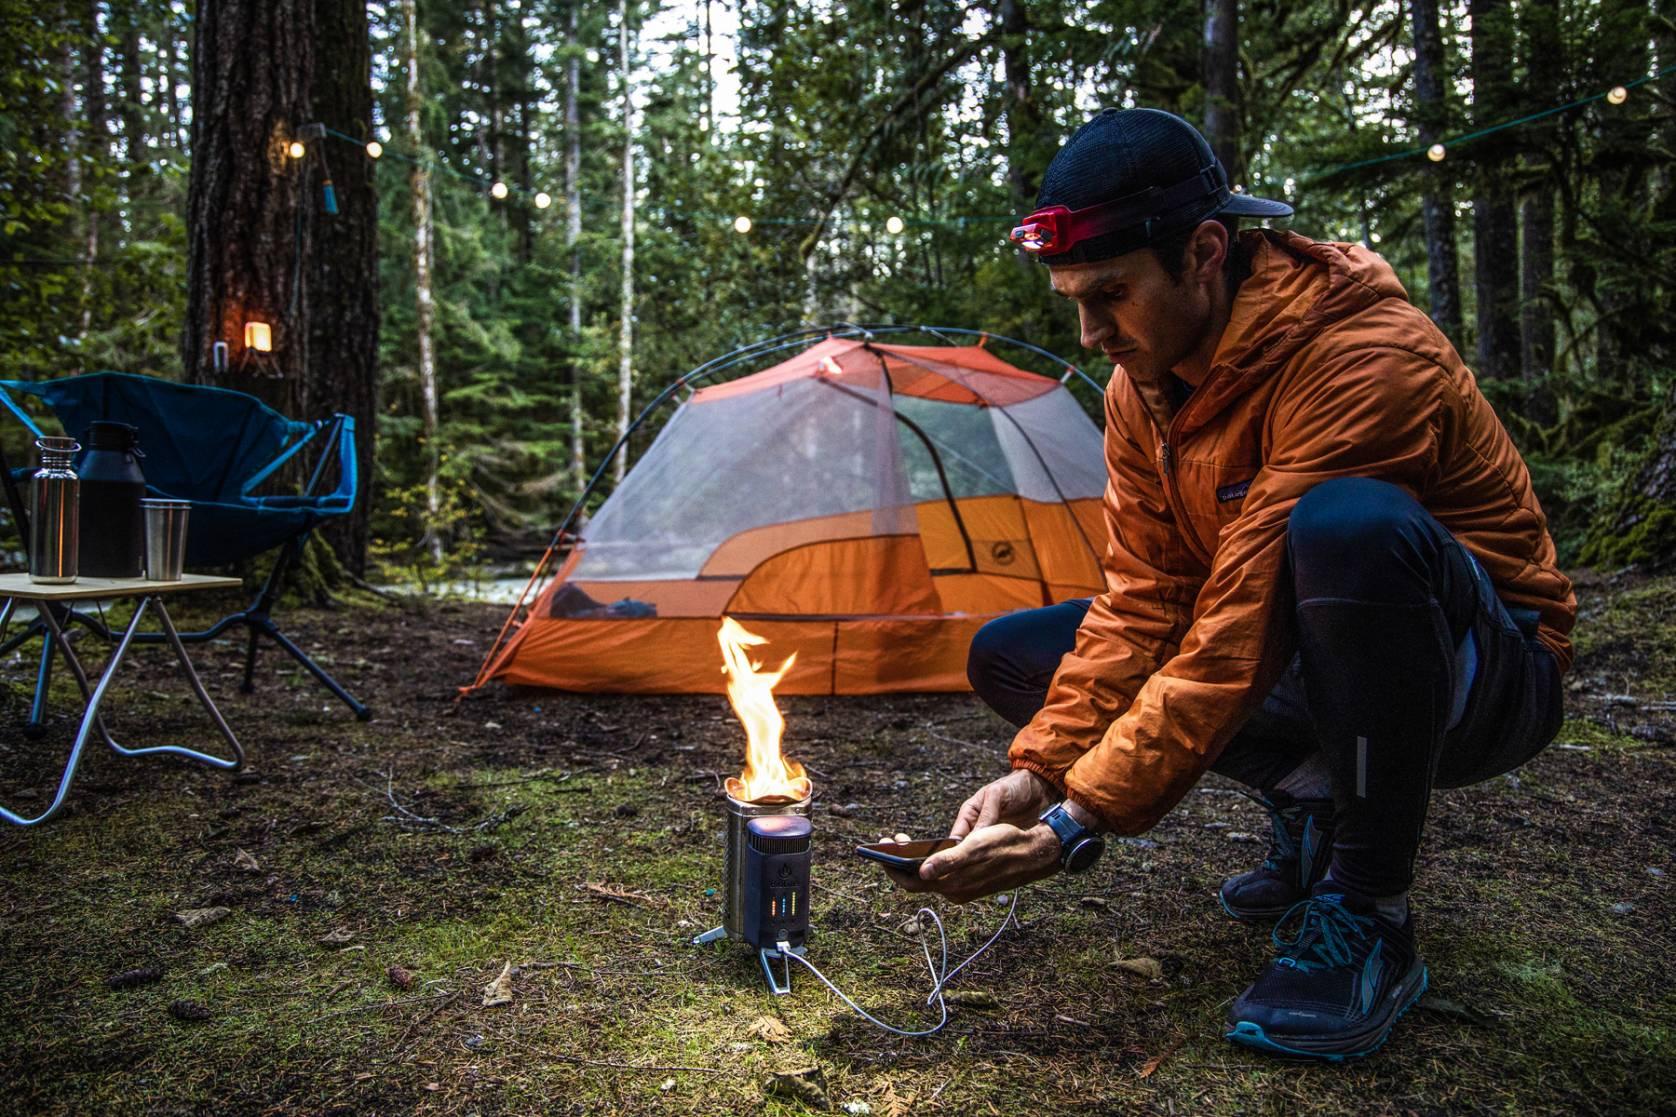 camper using a Climate Neutral BioLite CampStove 2 tentside